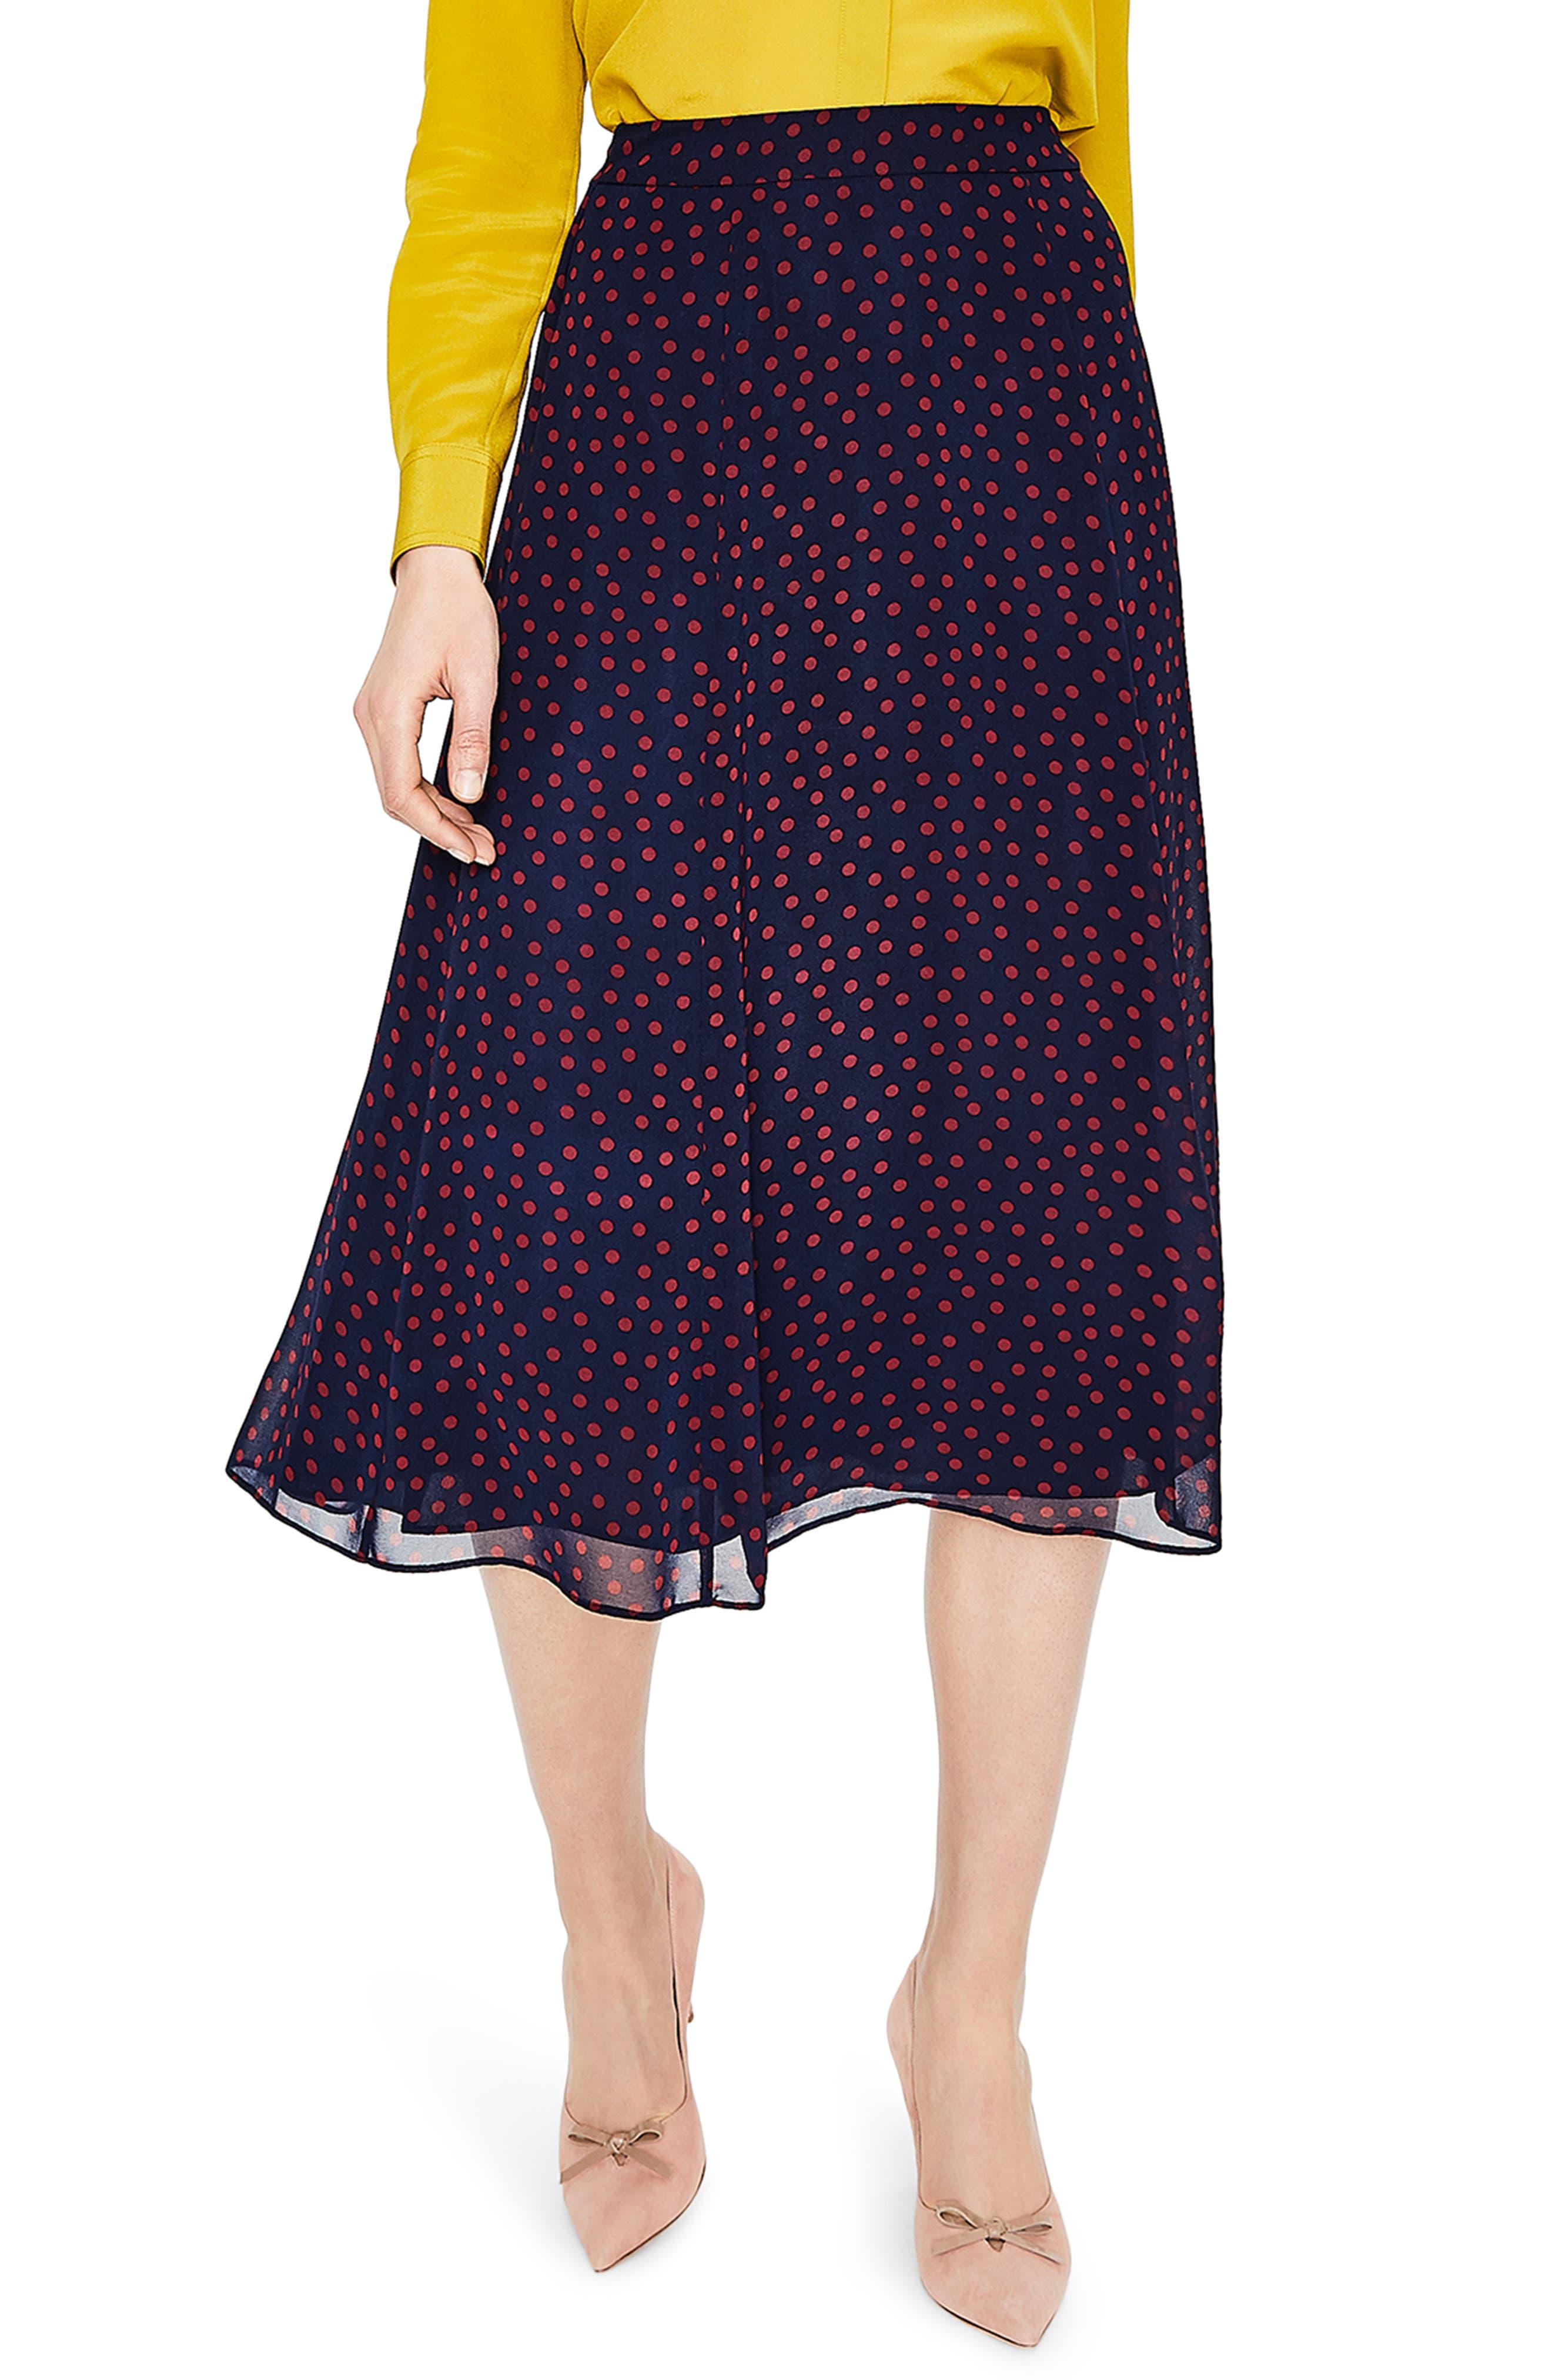 Polka Dot A-Line Skirt,                         Main,                         color, 934